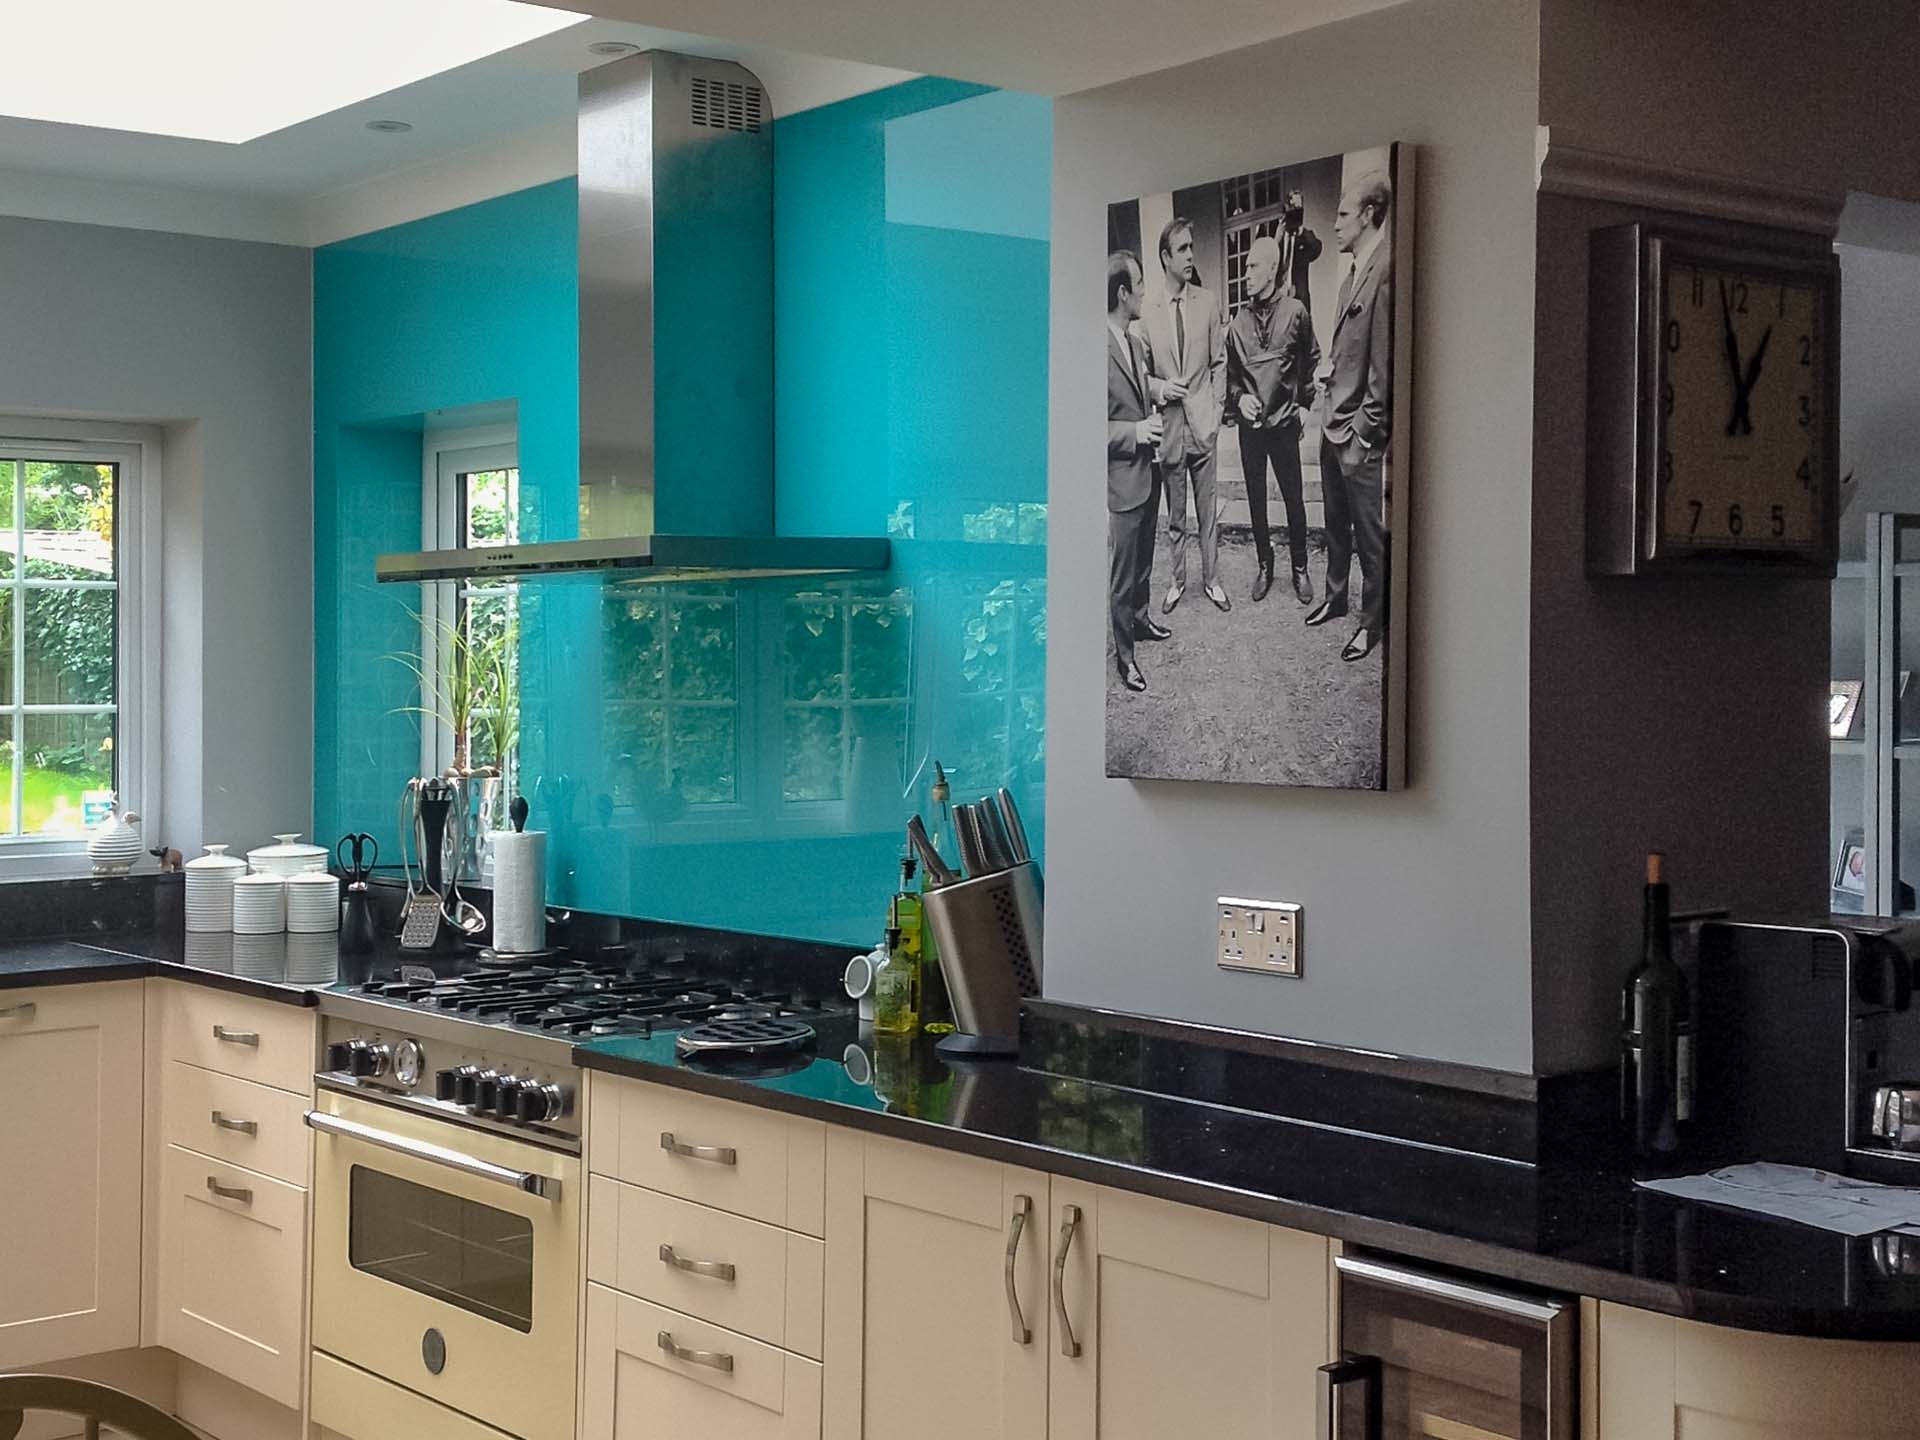 Black Galaxy Granite worktops Reigate Surrey Southern Counties Glass blue glass splashbacks